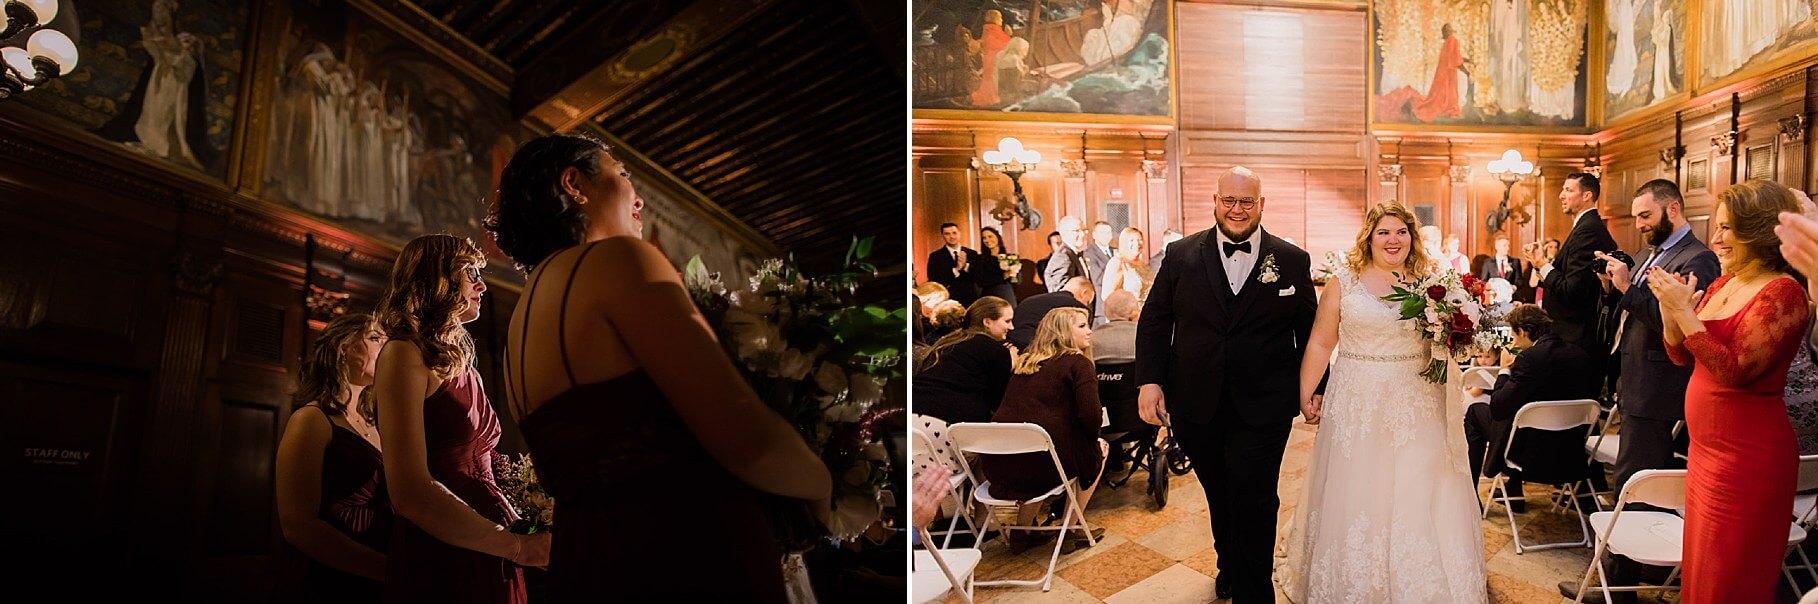 Boston Public Library Wedding-62.jpg